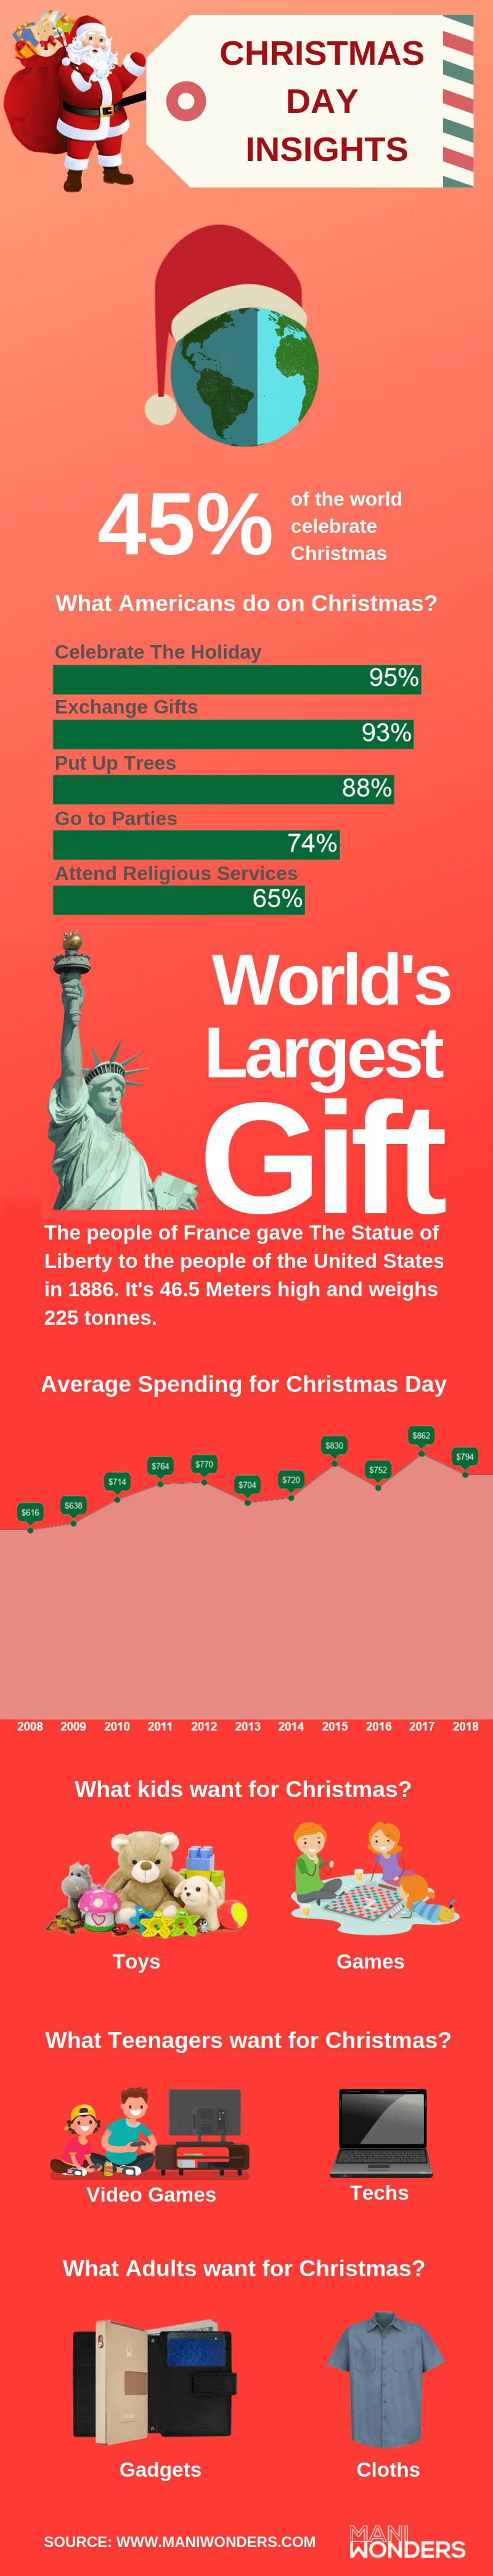 Christmas-Insights-infographic-plaza